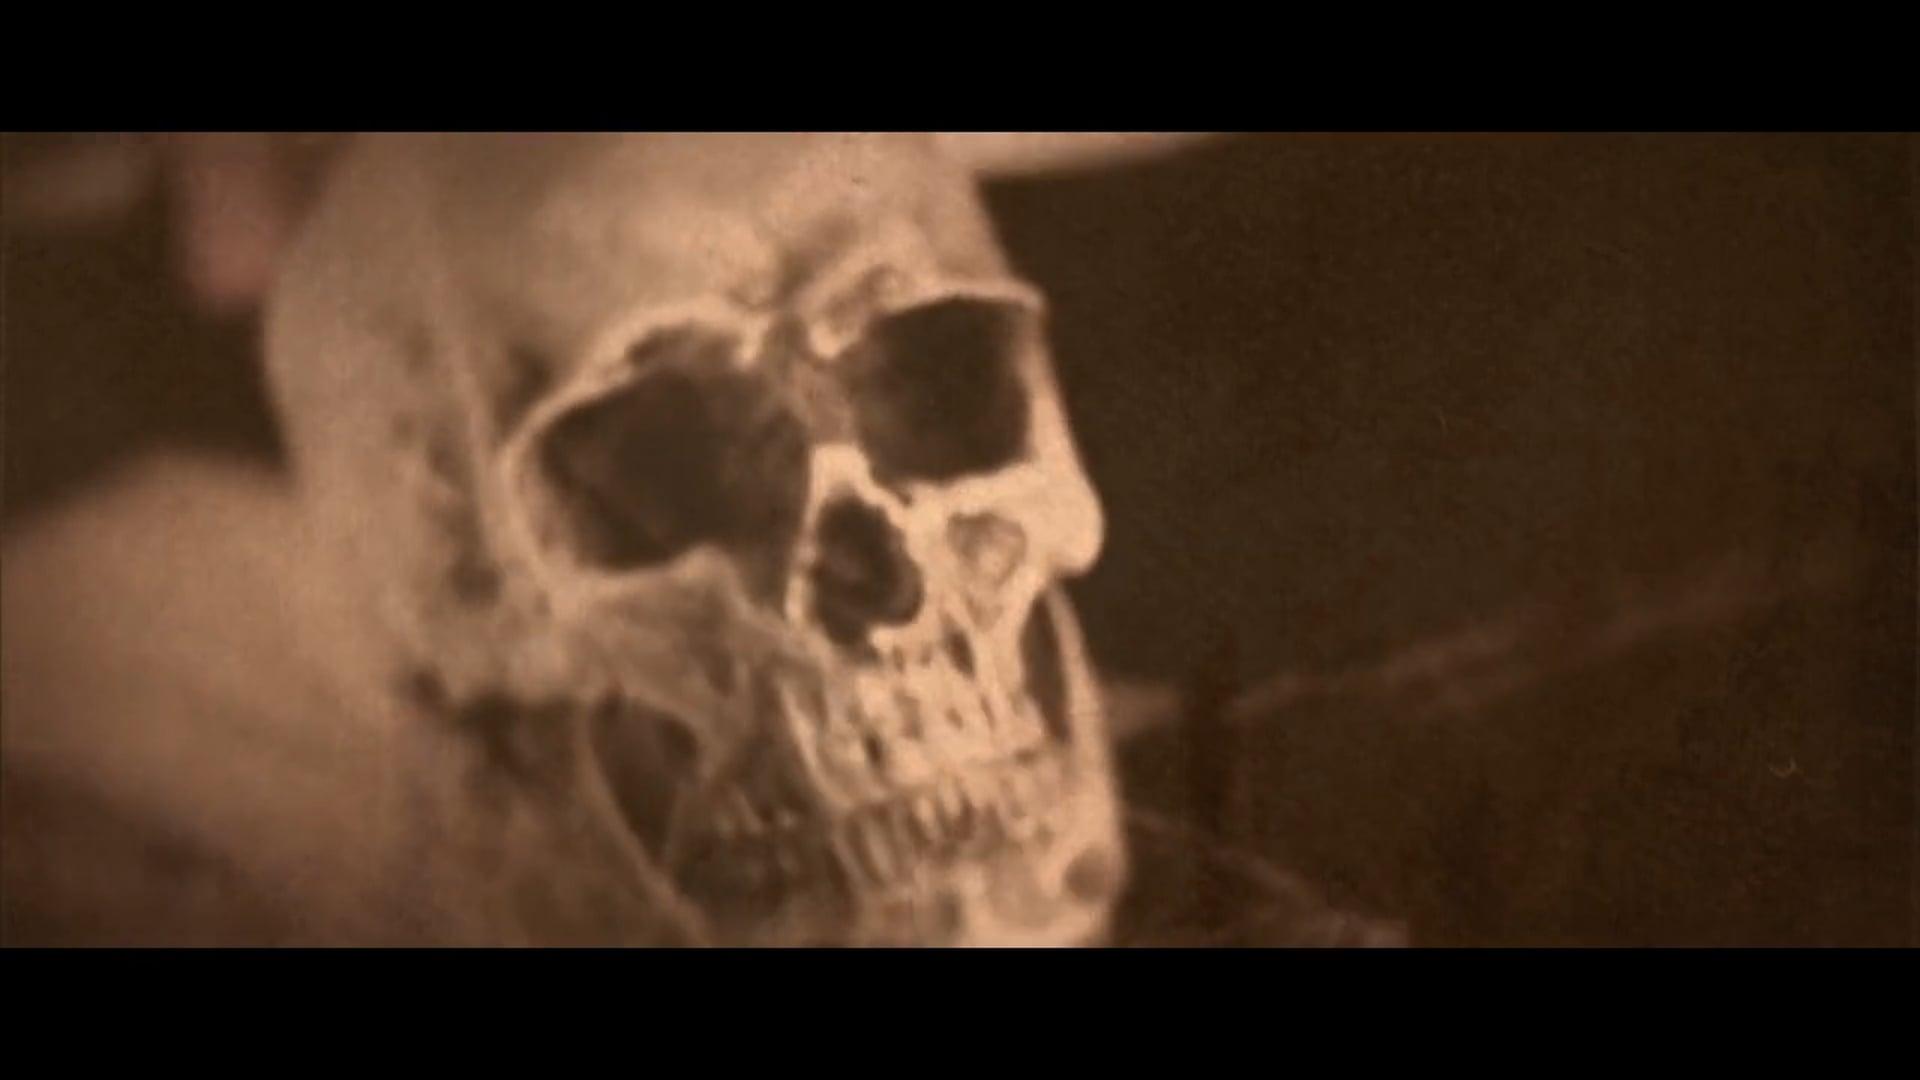 SIDESHOW - Halloween Promo Video